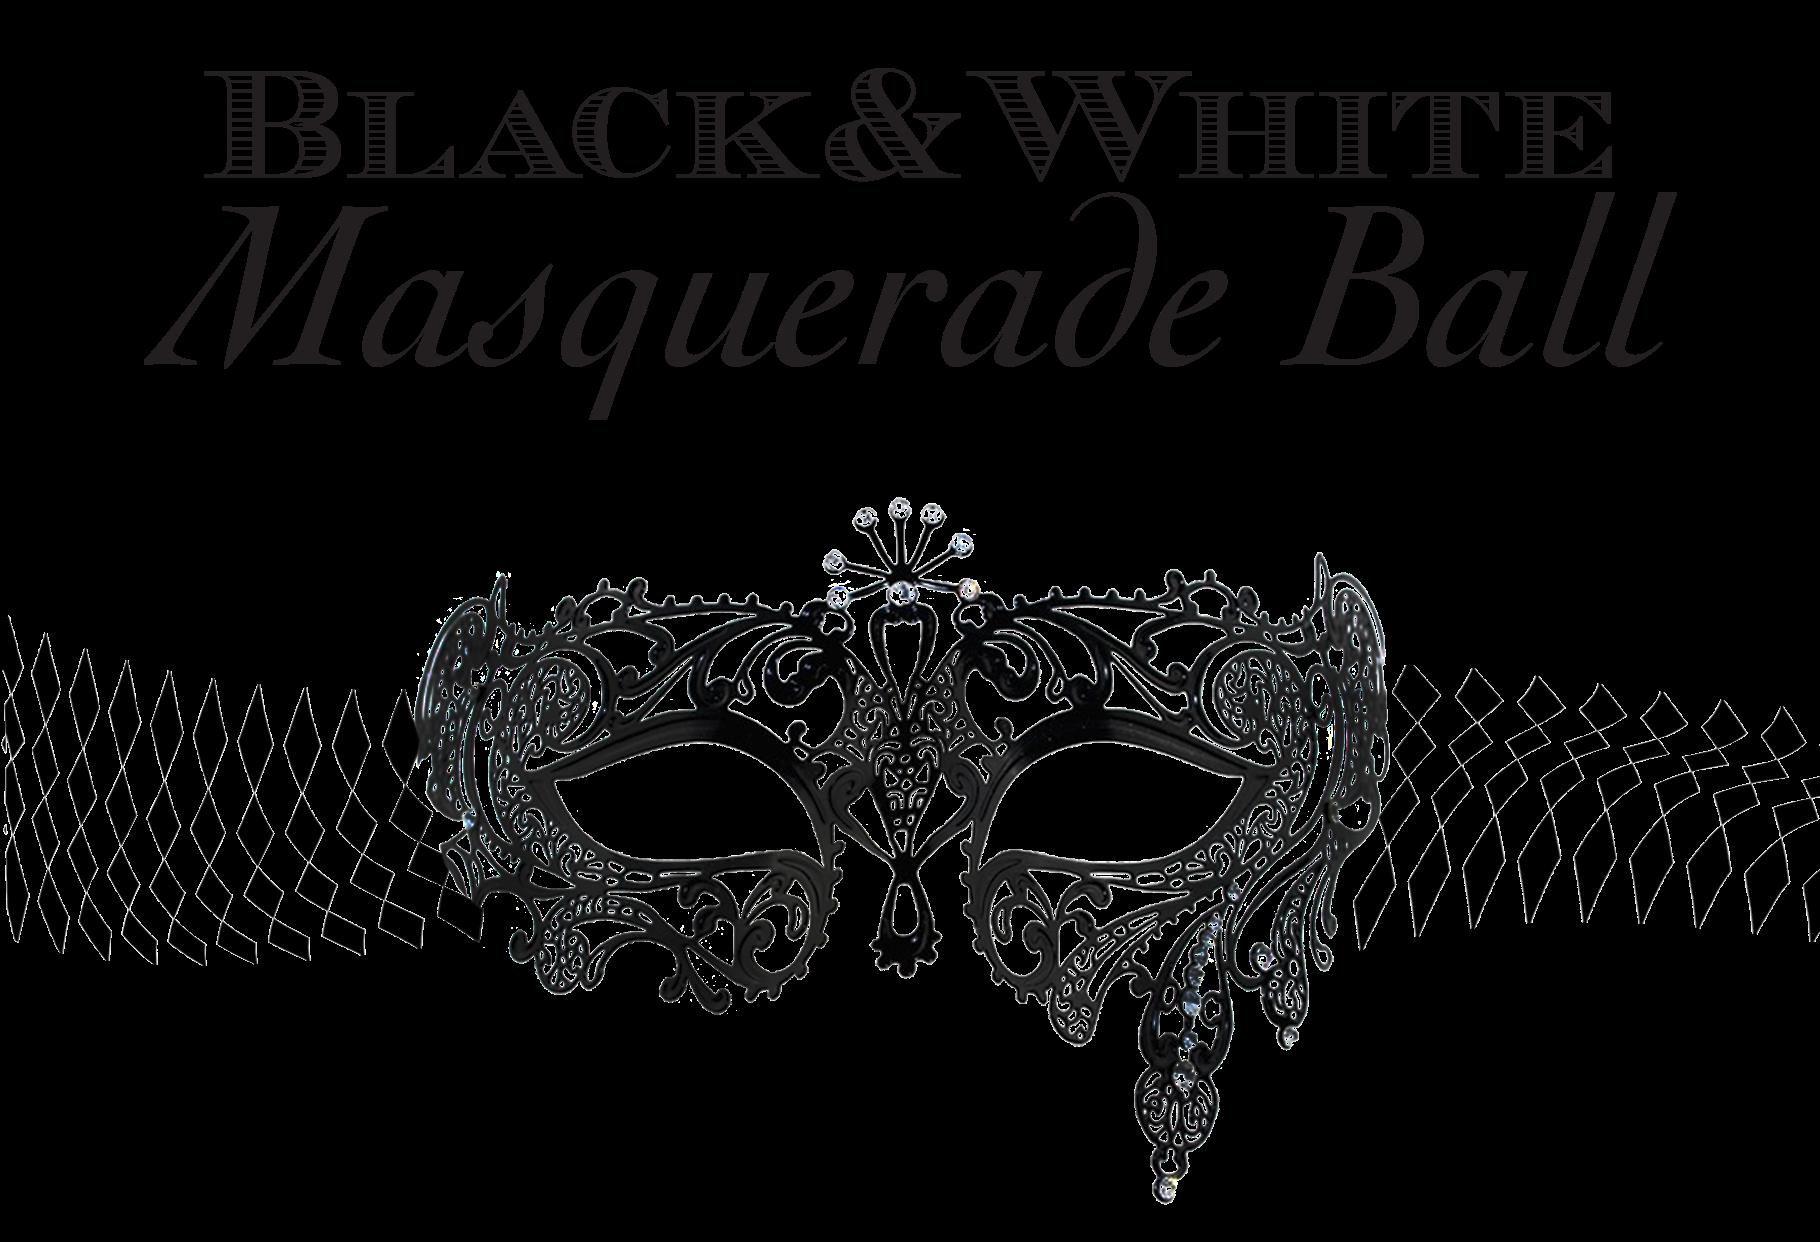 2017 Black & White Ball